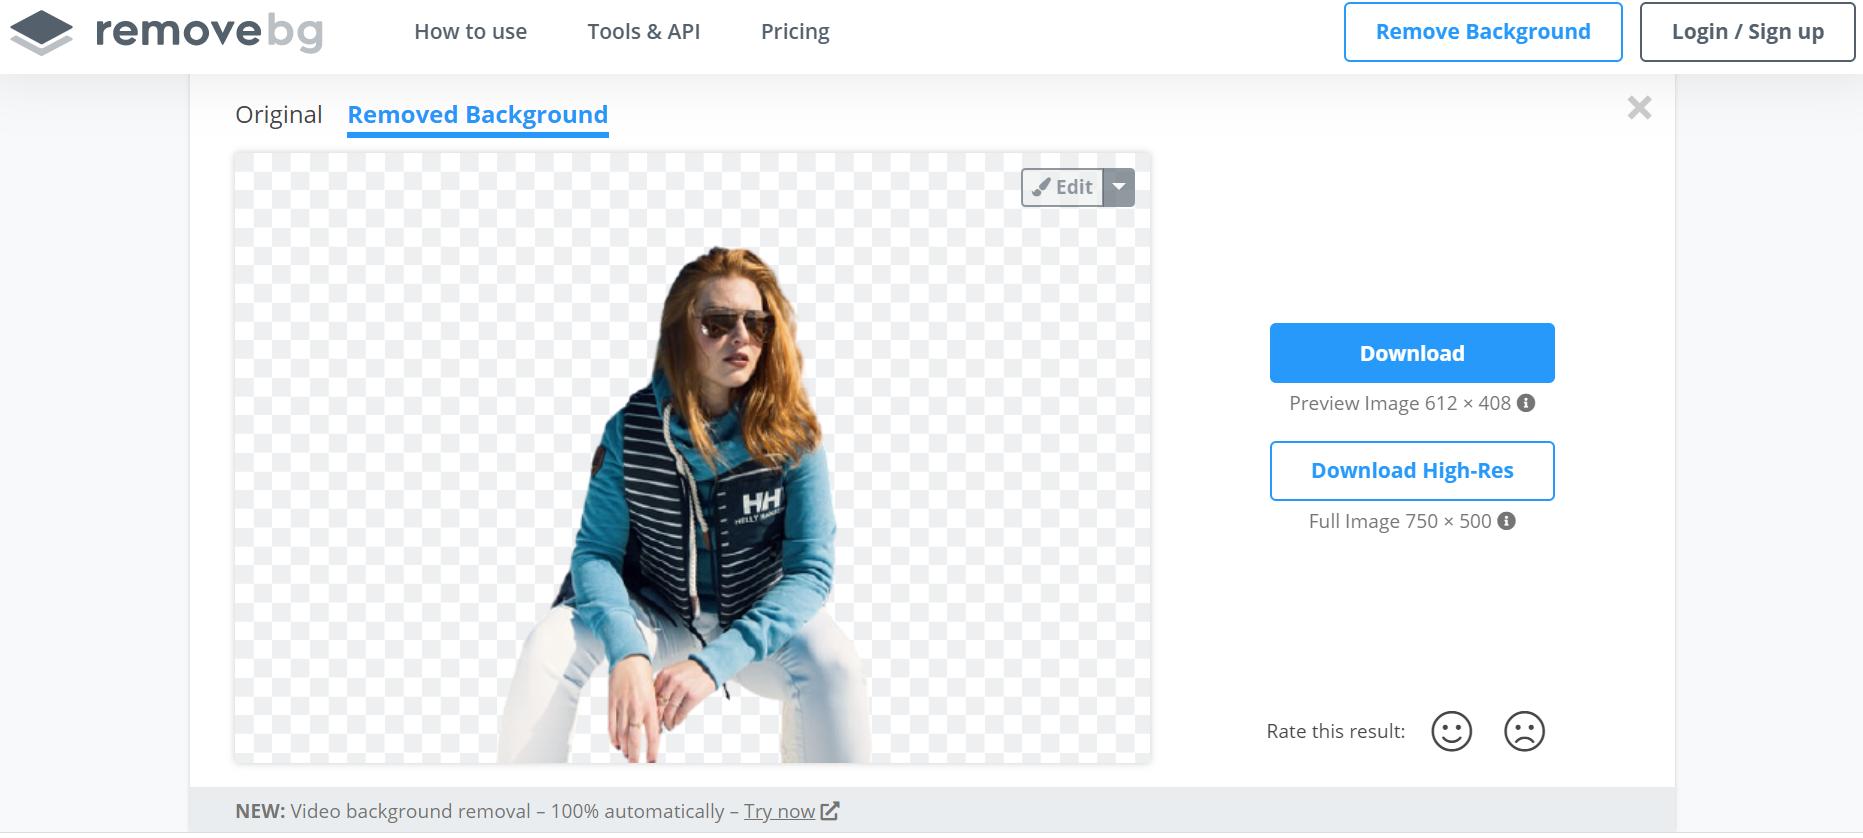 remove-bg-transparent-background